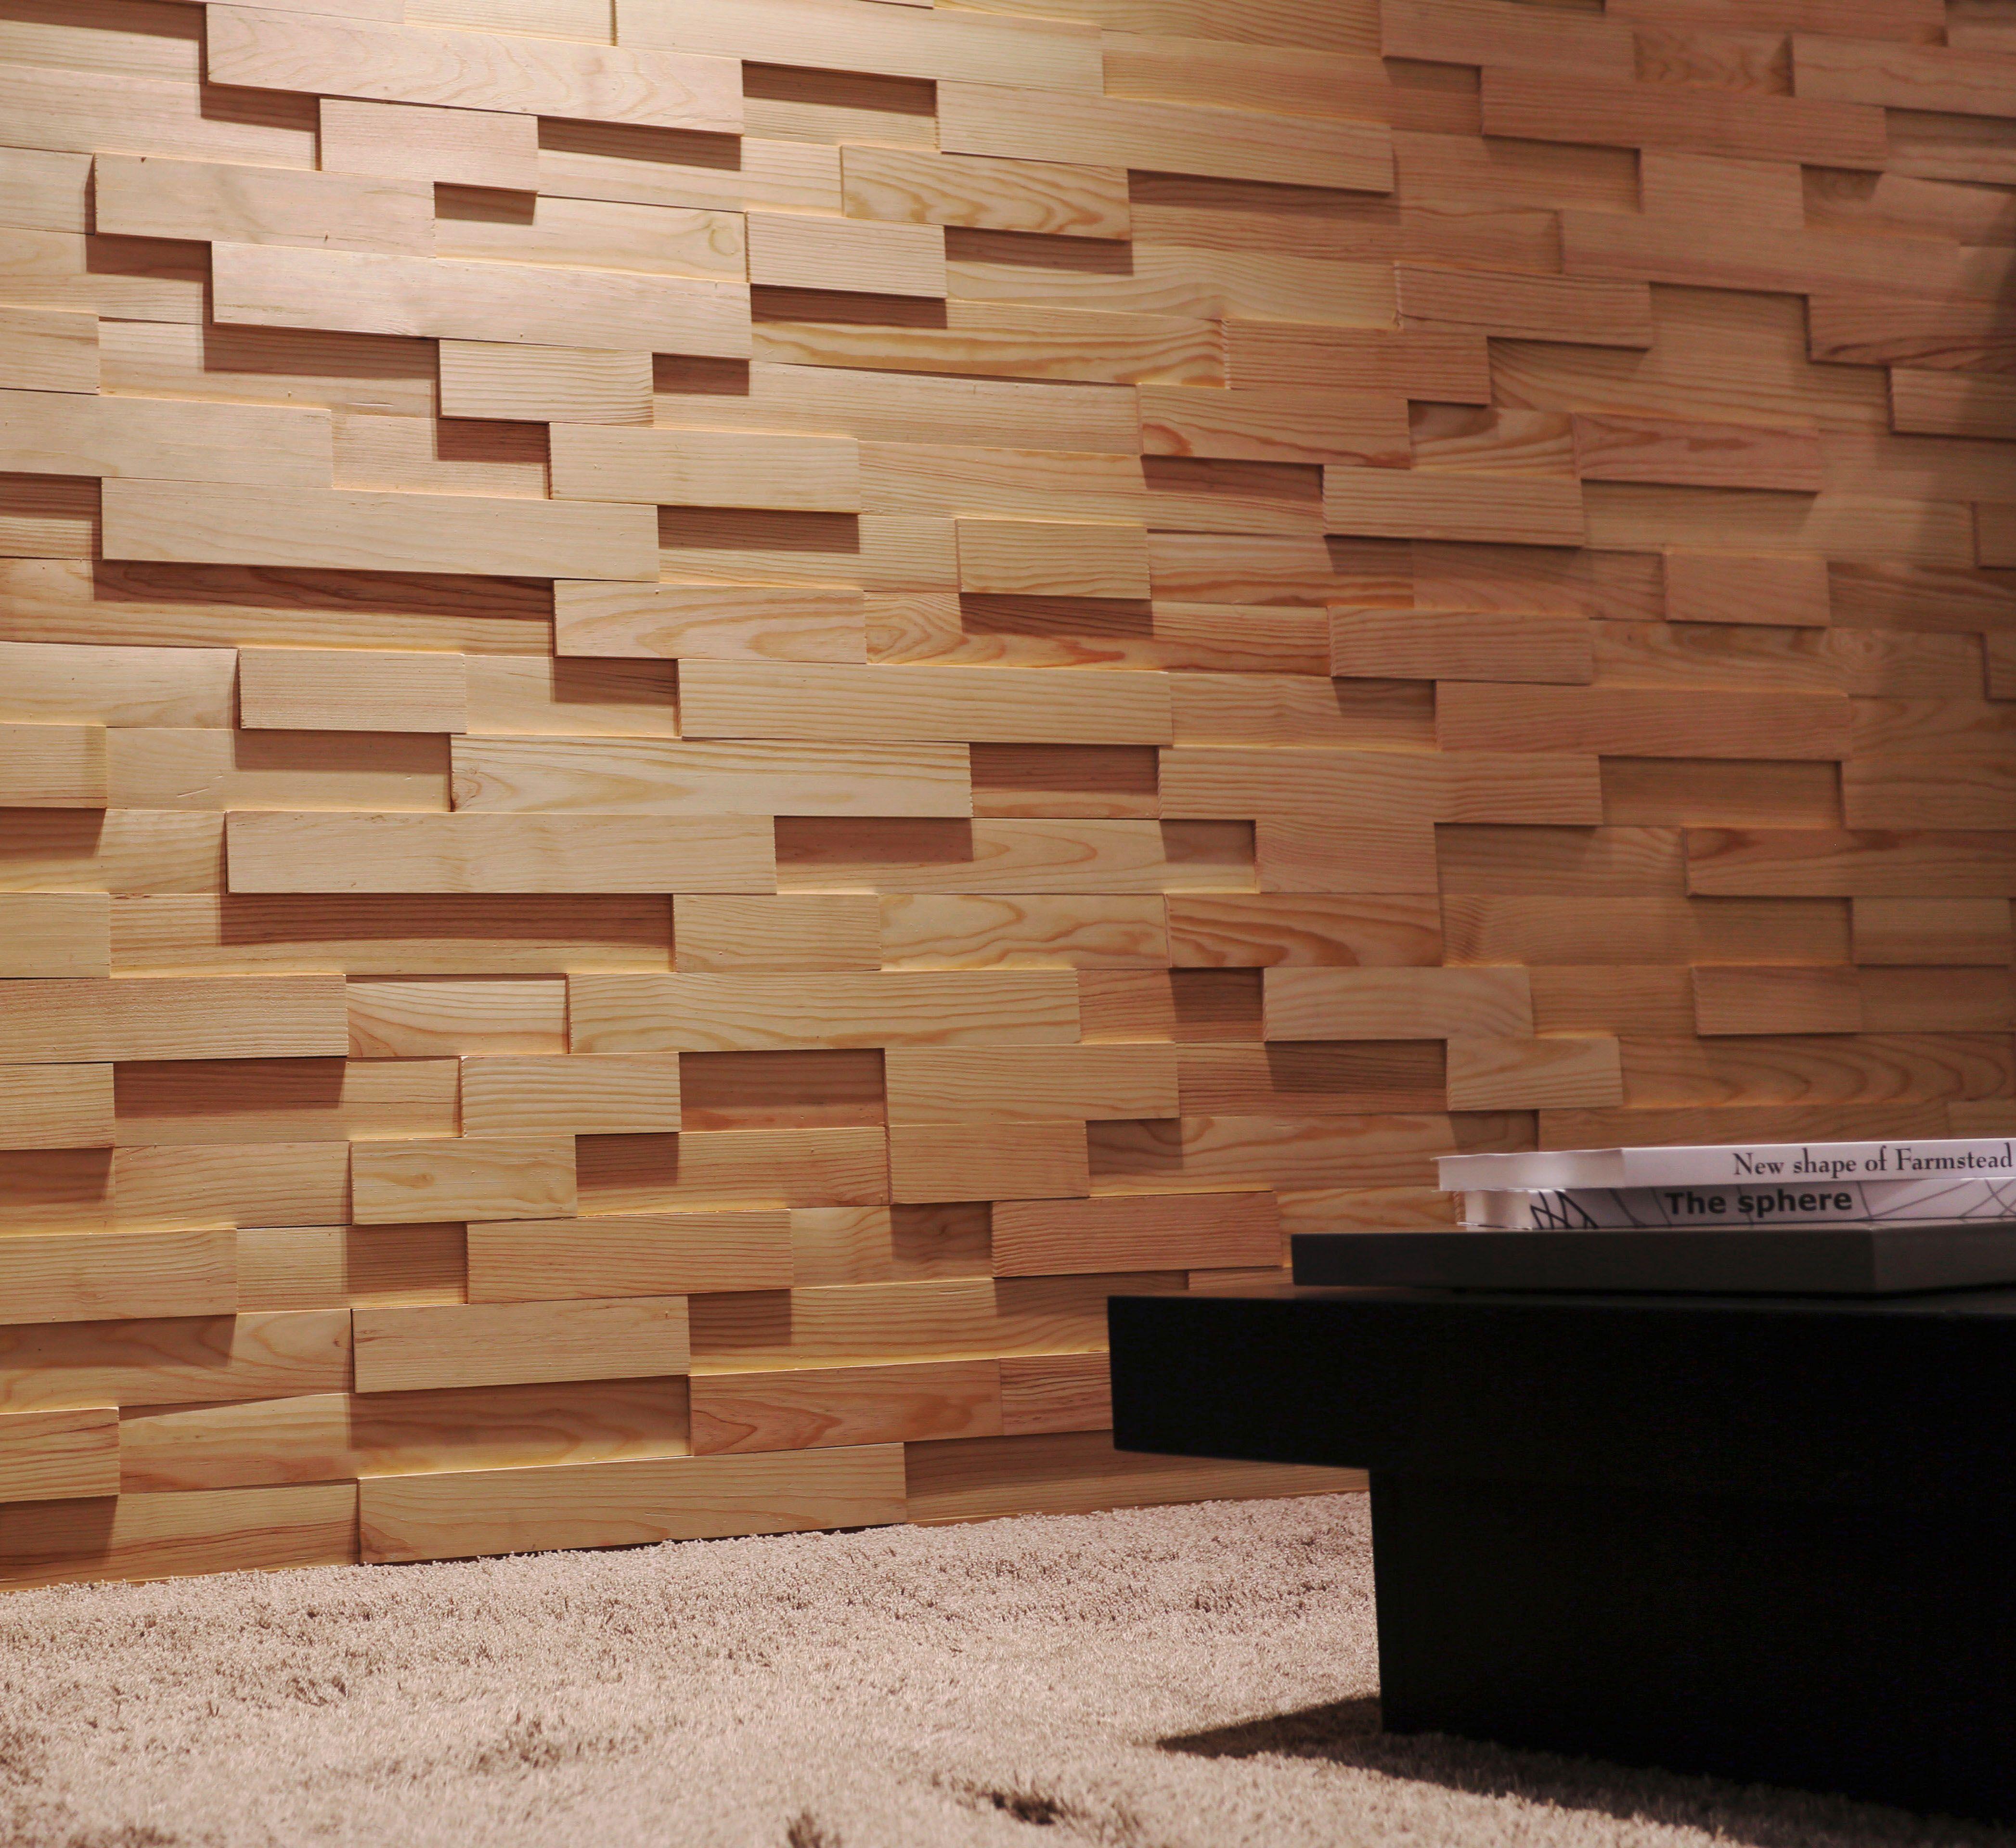 lambris adh sif castorama le lambris fait peau neuve. Black Bedroom Furniture Sets. Home Design Ideas